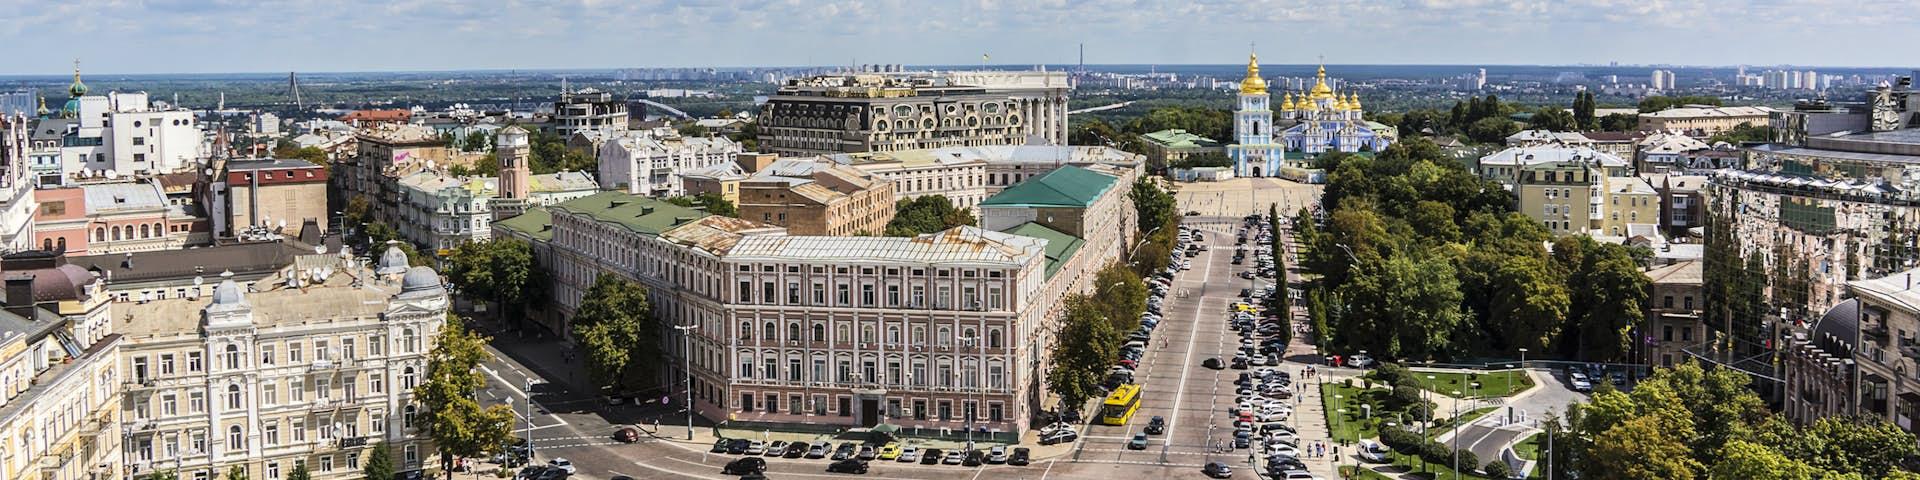 PhD Programmes in Kiev - Ukraine - PhDPortal.com